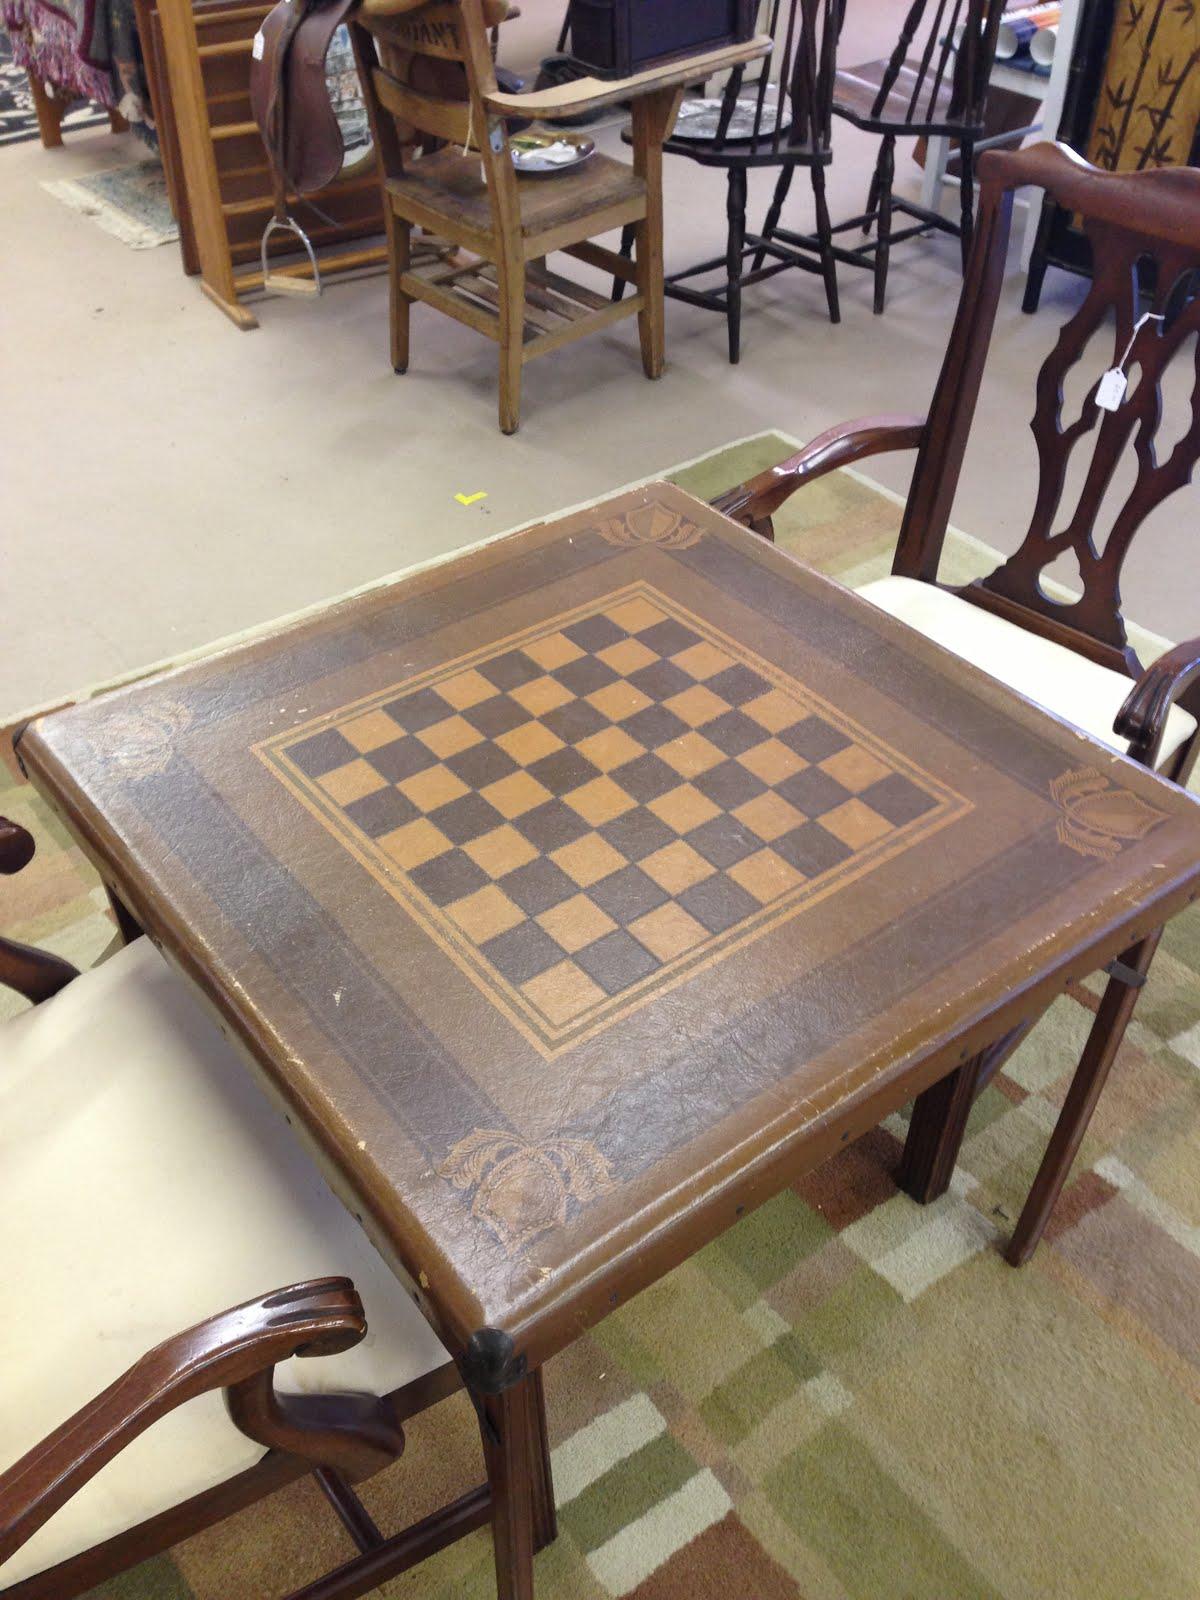 Checkers Anyone Antique Samson Luggage Checker Table 65